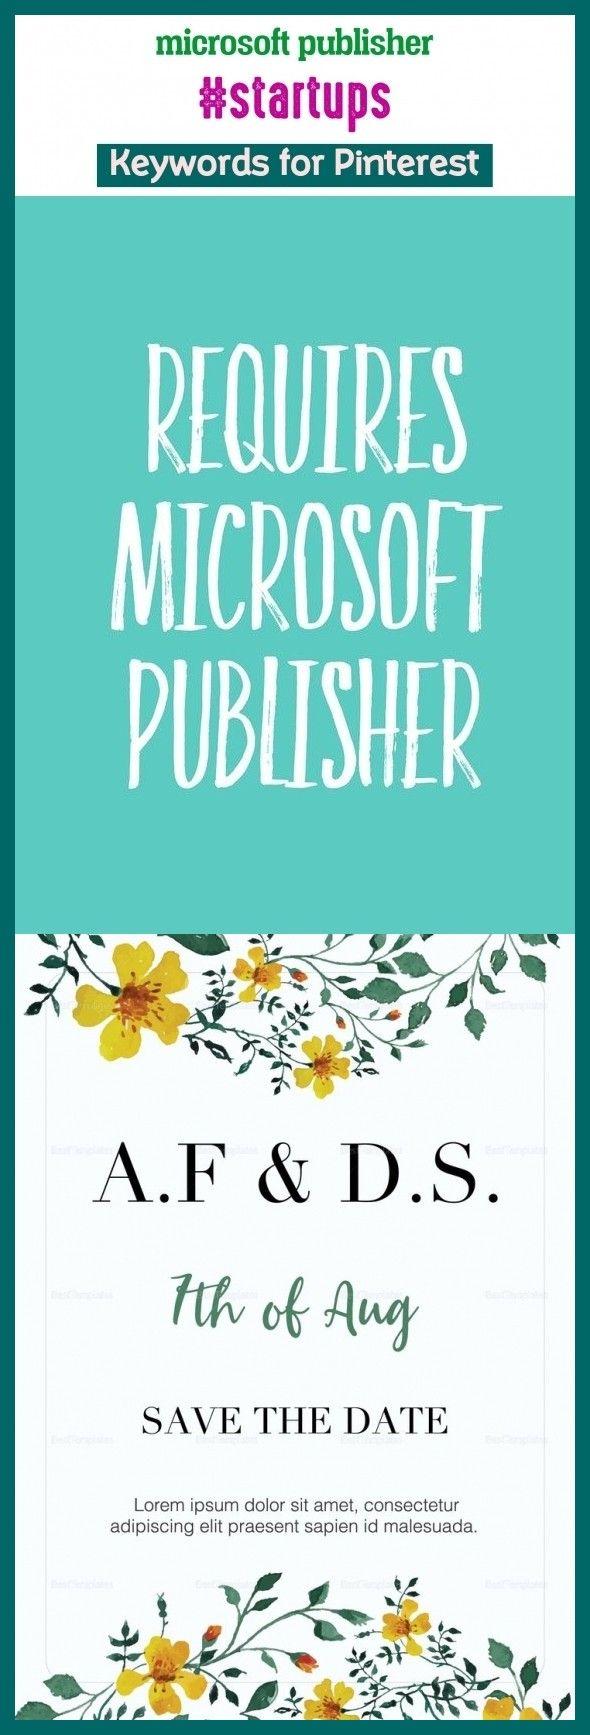 Microsoft publisher startups pinterestkeywords tech